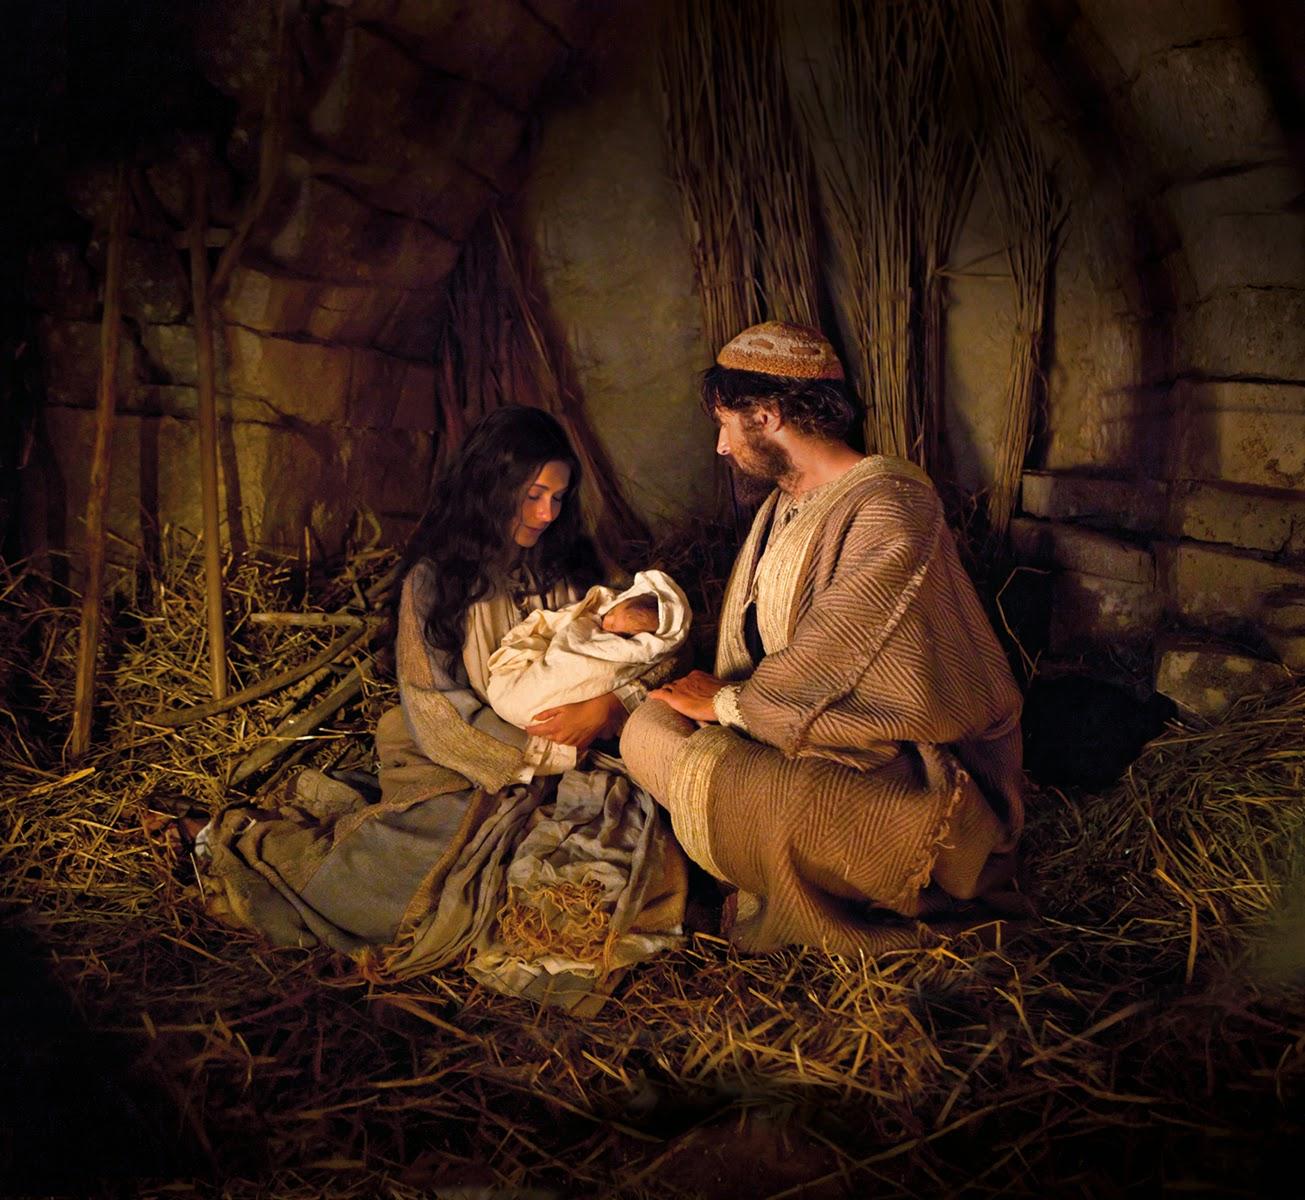 nativity jesus christ lds wallpaper - photo #5